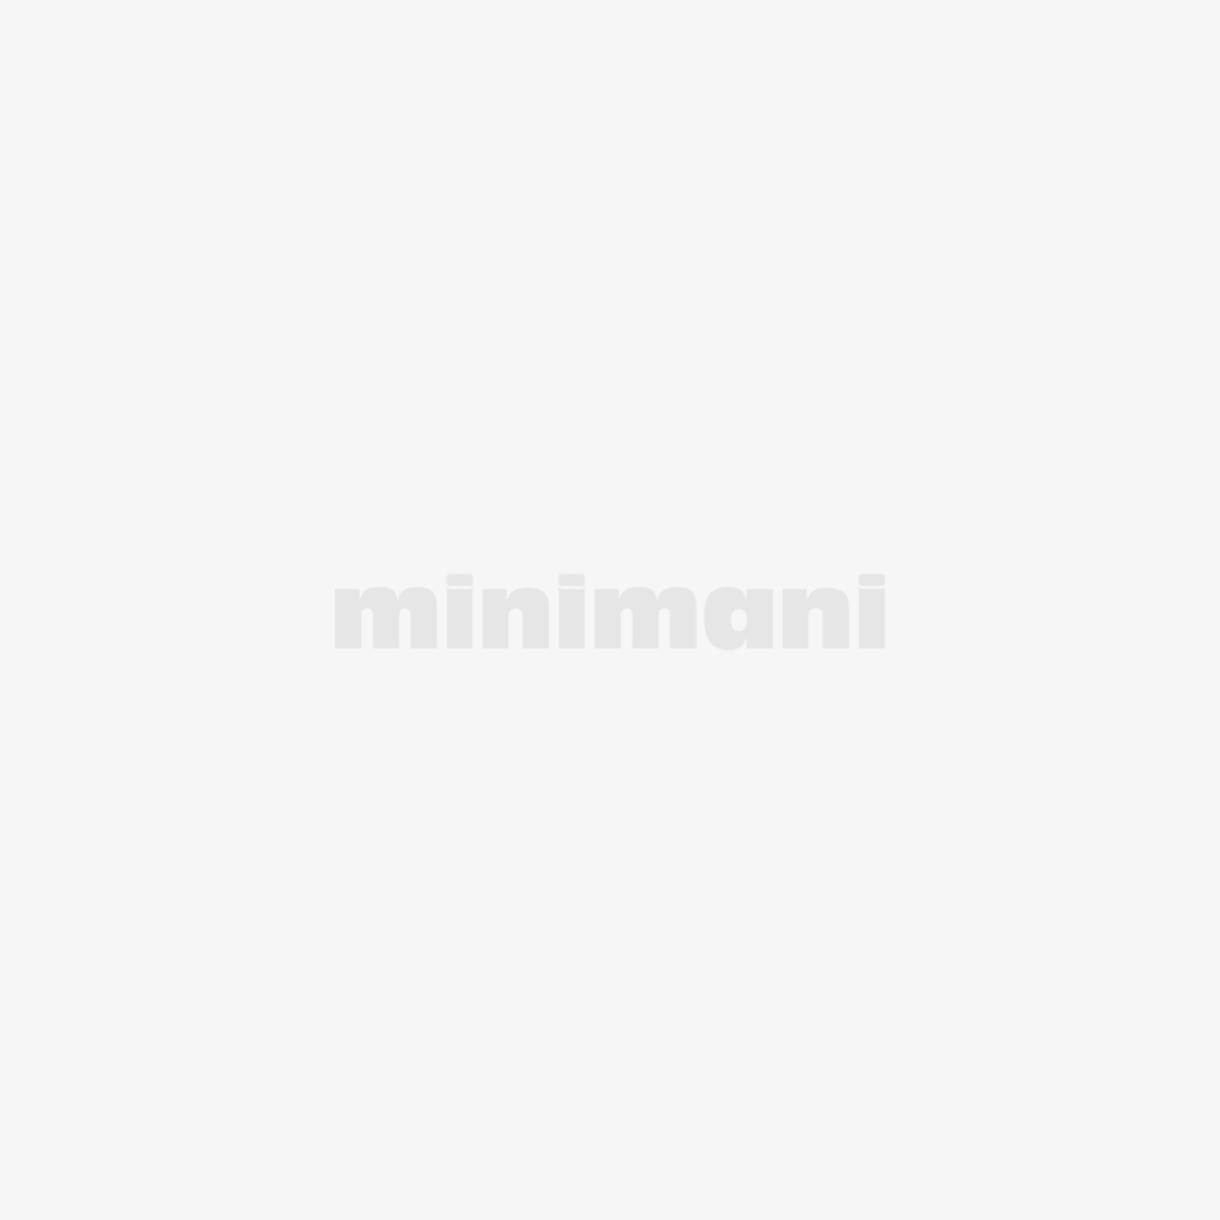 Fiskars PowerGear™ raivaussakset (L) L78 1000584, ohileikaava malli